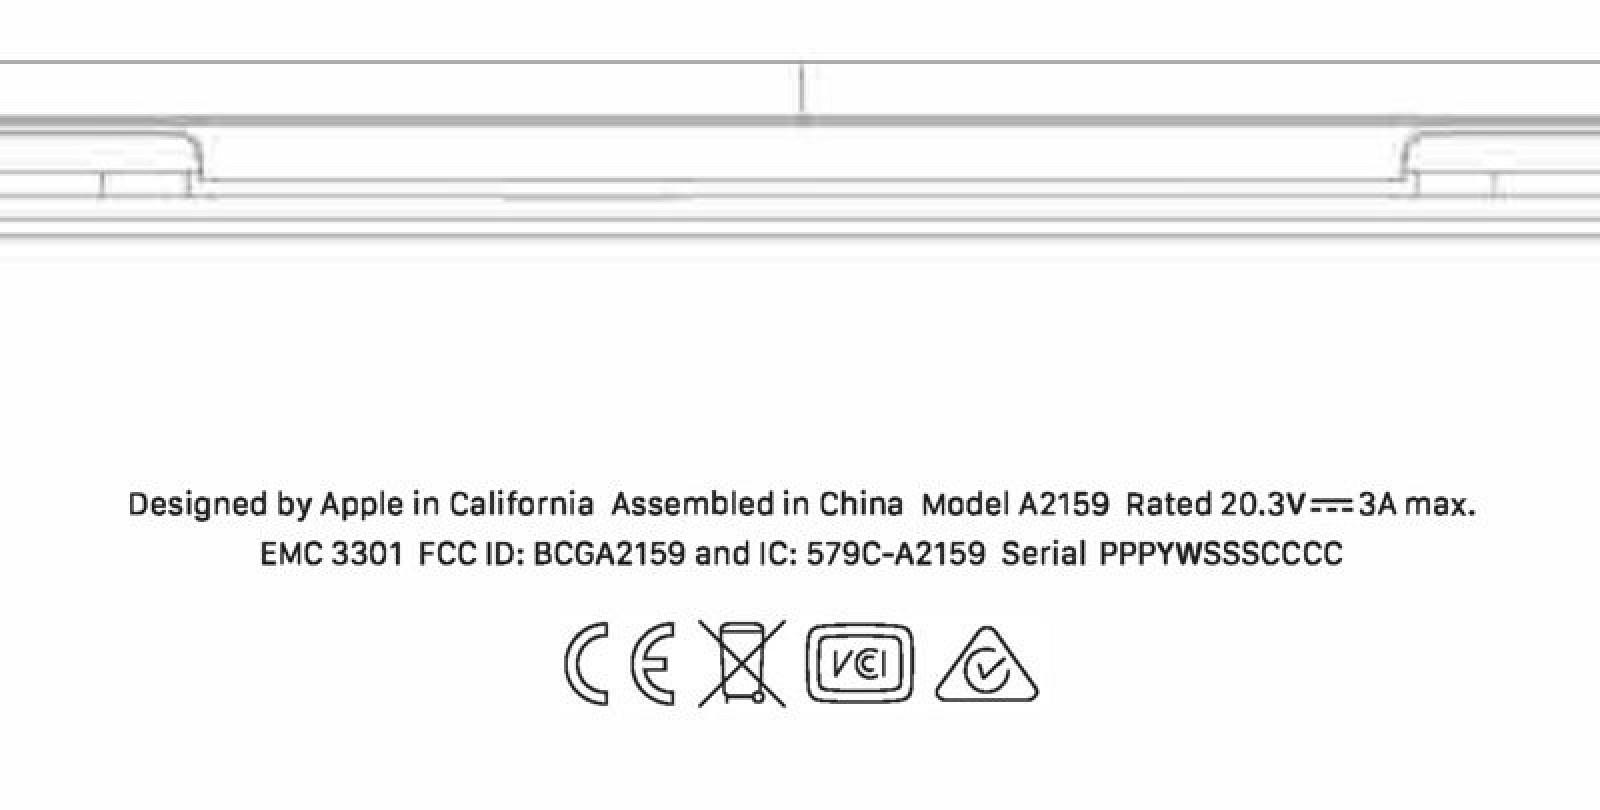 Fcc Approve New Macbook Pro 13 Inch 32gb Ram Option Img 2